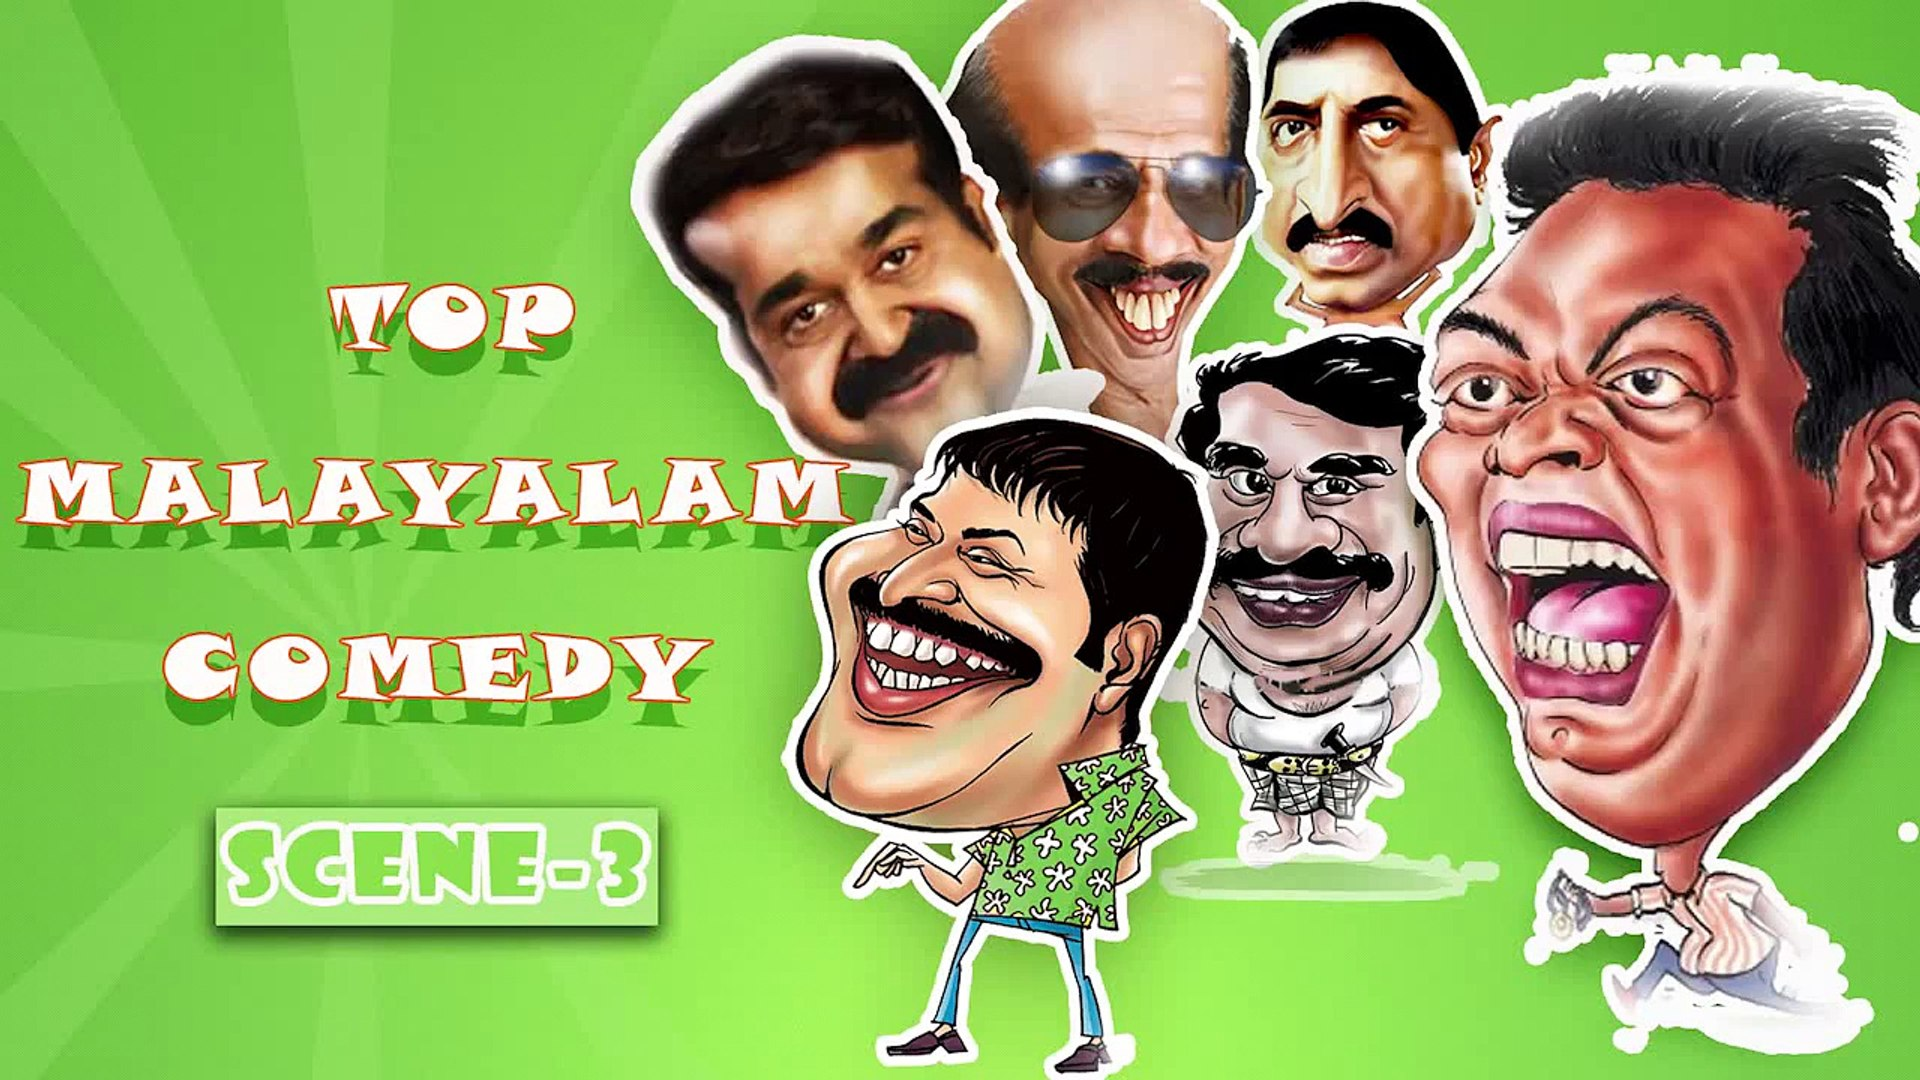 Malayalam Movie Top Comedy Scene 3 | Malayalam Comedy Scenes | Malayalam Movie Comedy Scen